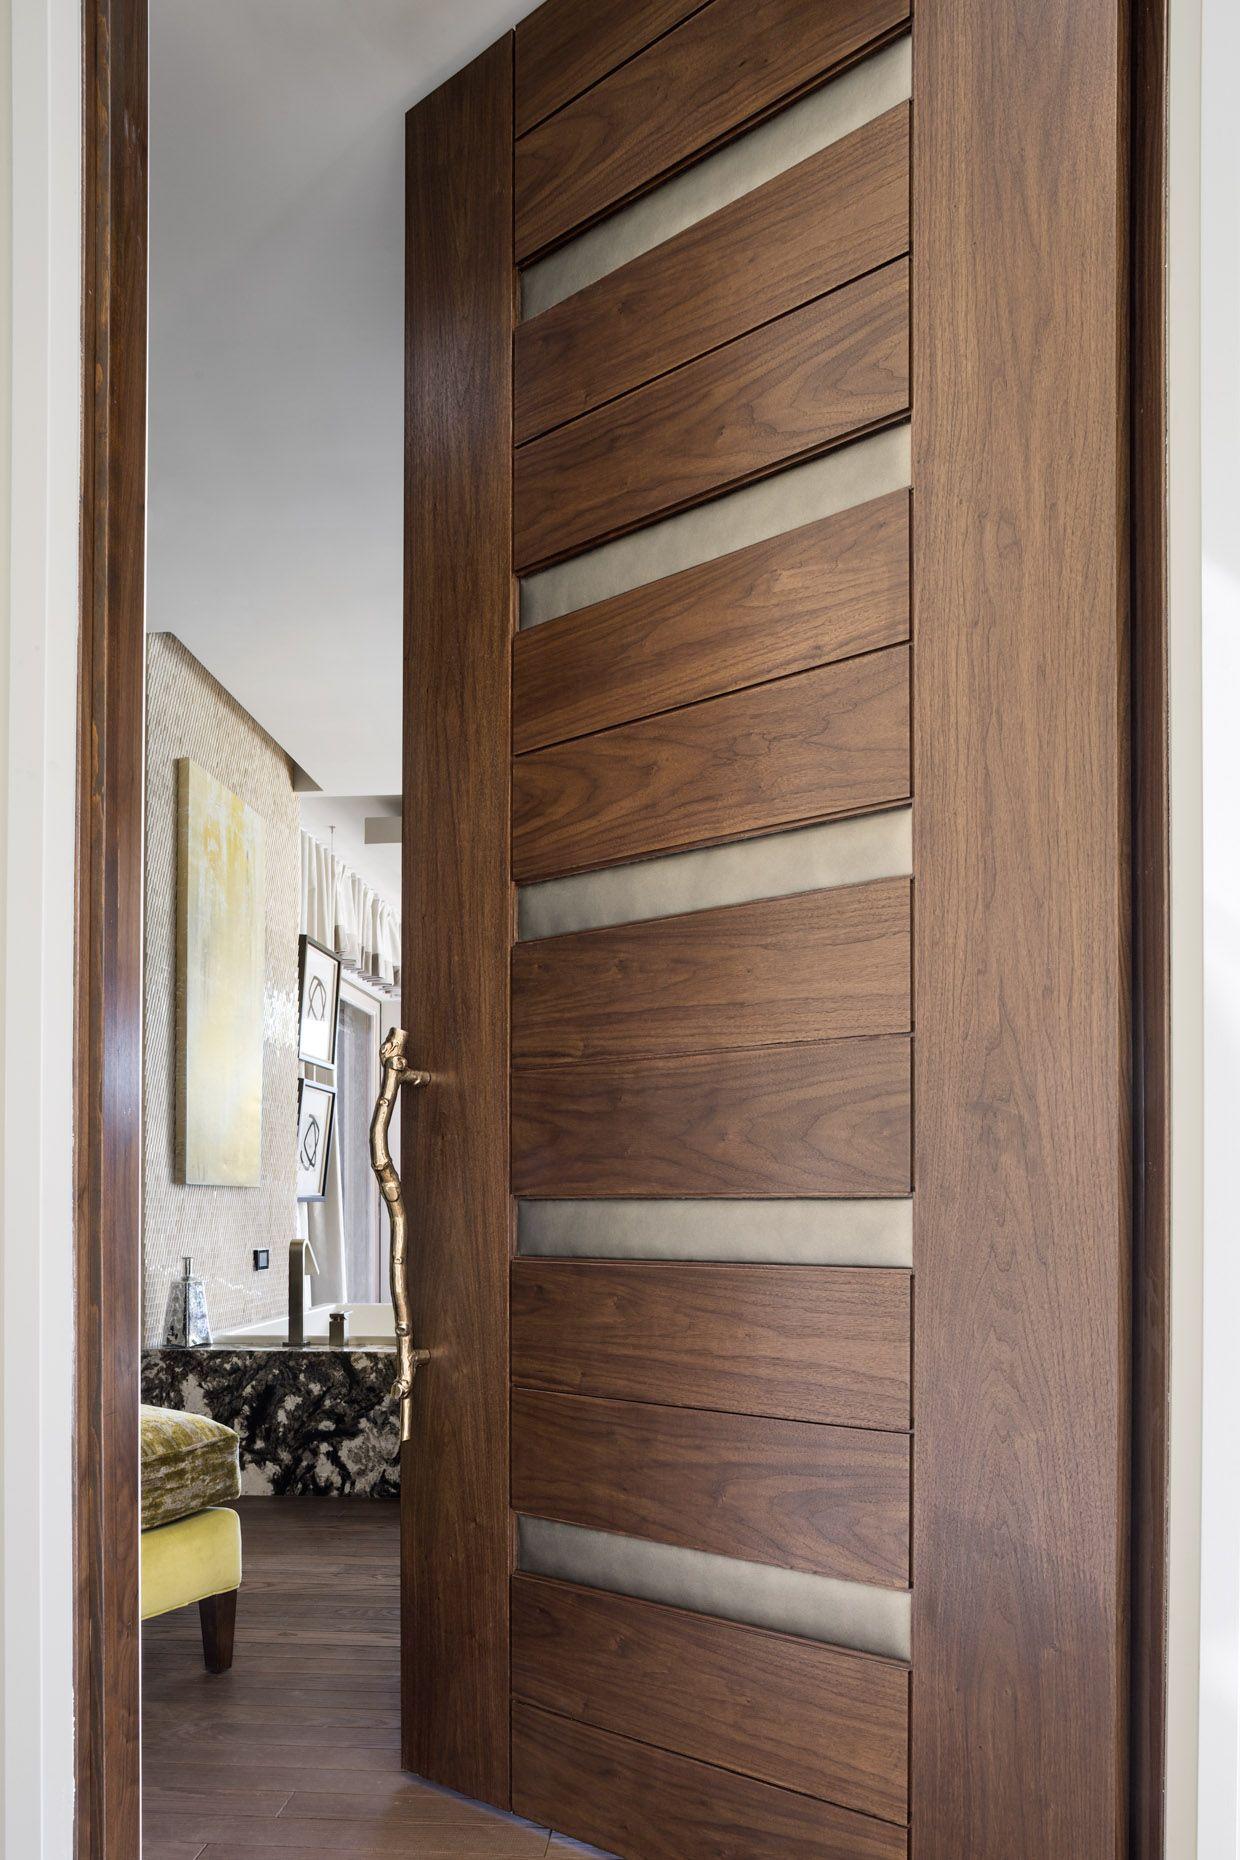 TruStile Modern Door Collection - TM13340 in Walnut with ...